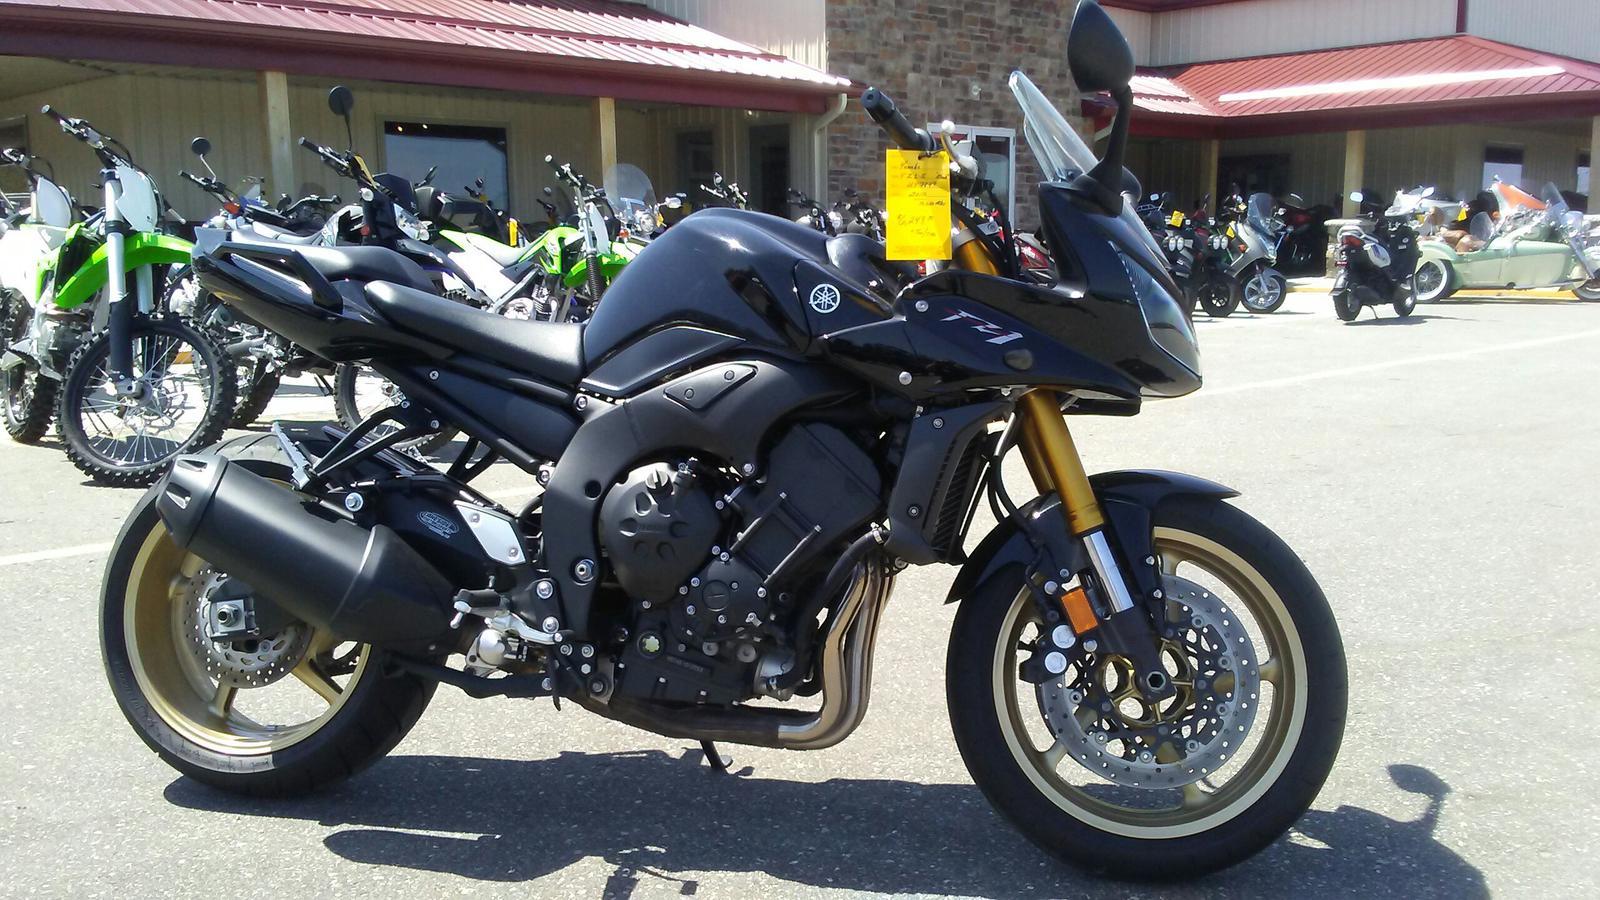 2010 Yamaha FZ1 for sale in Mecosta, MI. Lakeside Motor Sports ...